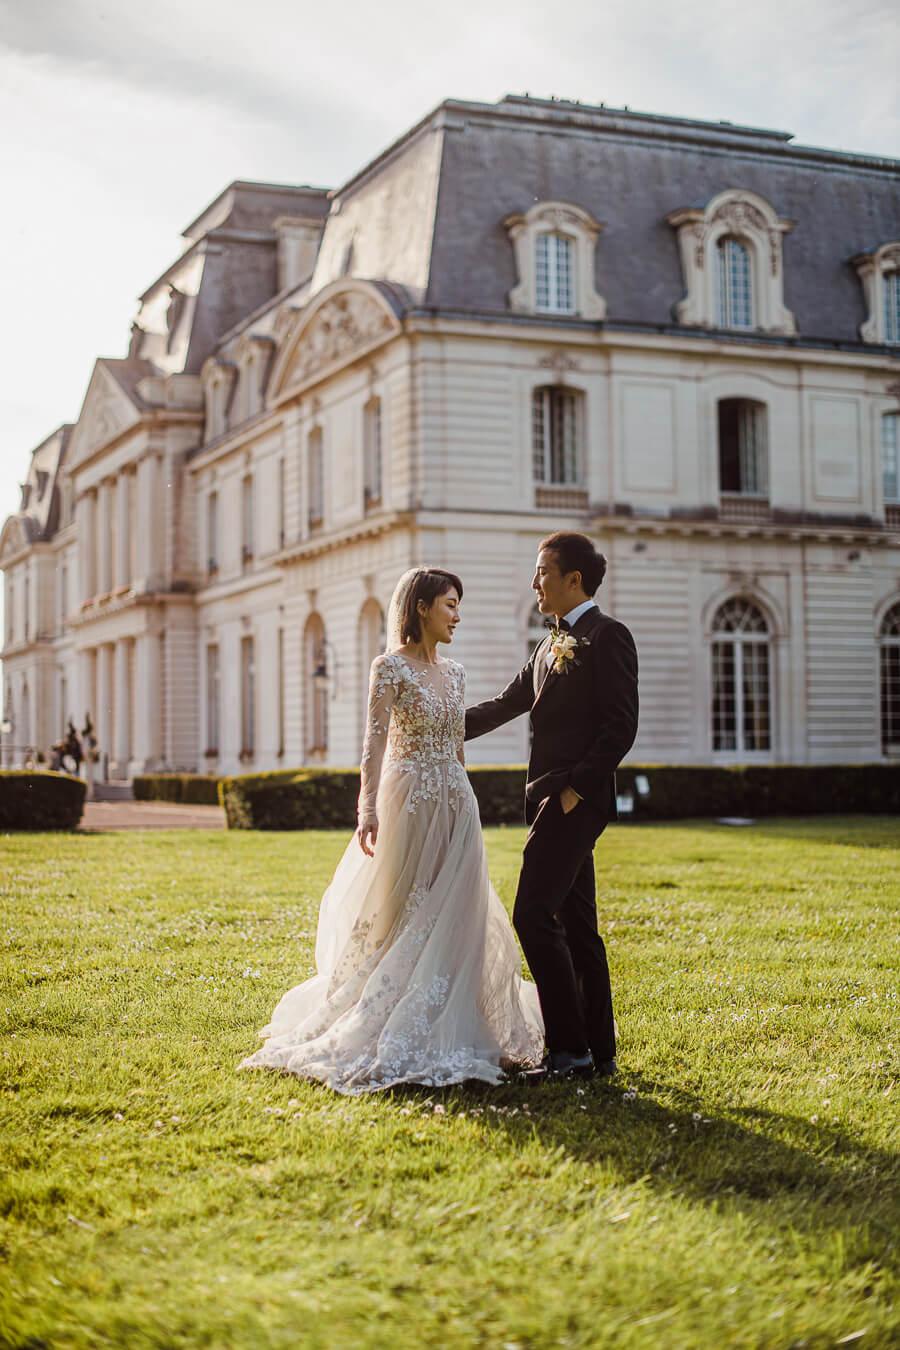 posed wedding photographs